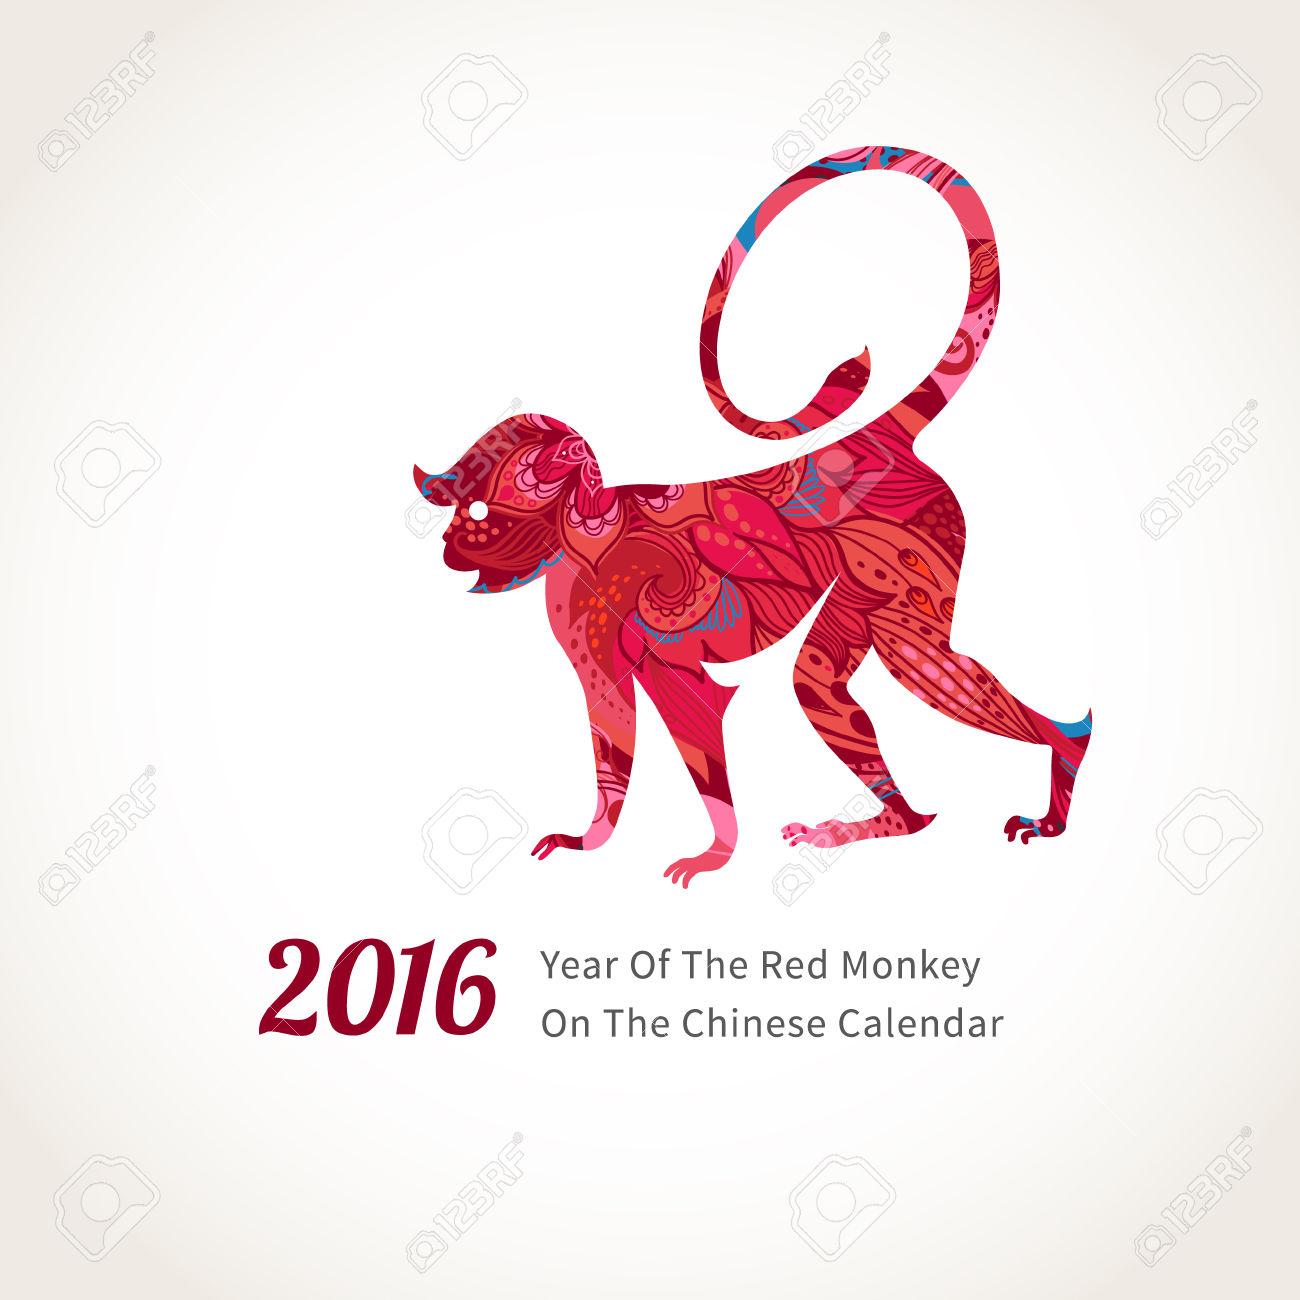 Monkey symbol of 2016 on the Chinese calendar.